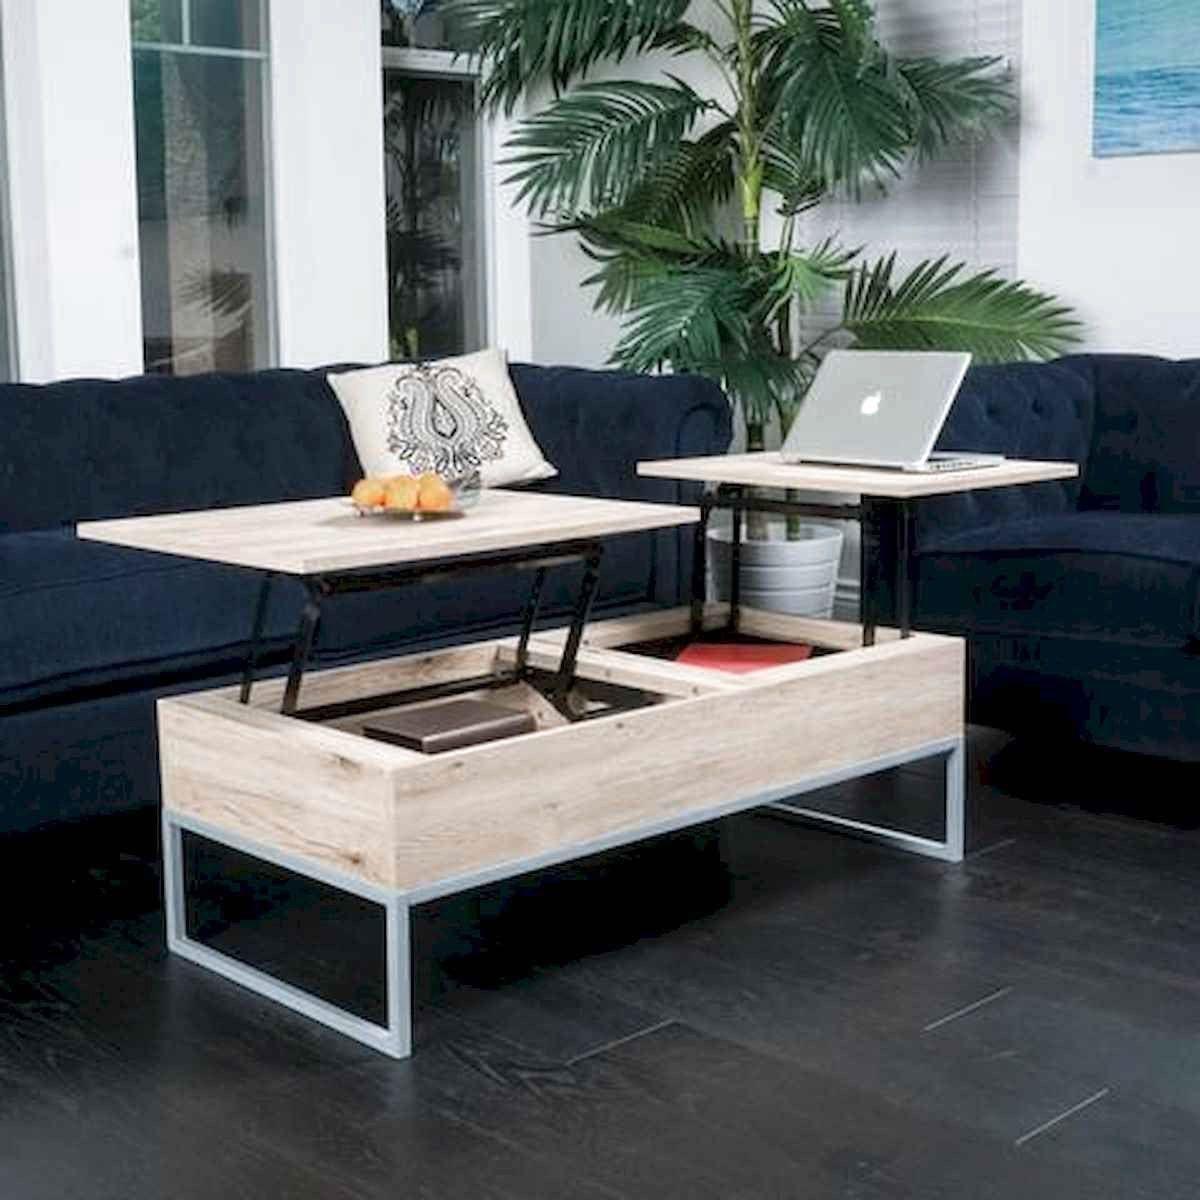 Favorite Diy Projects Furniture Living Room Table Design ...